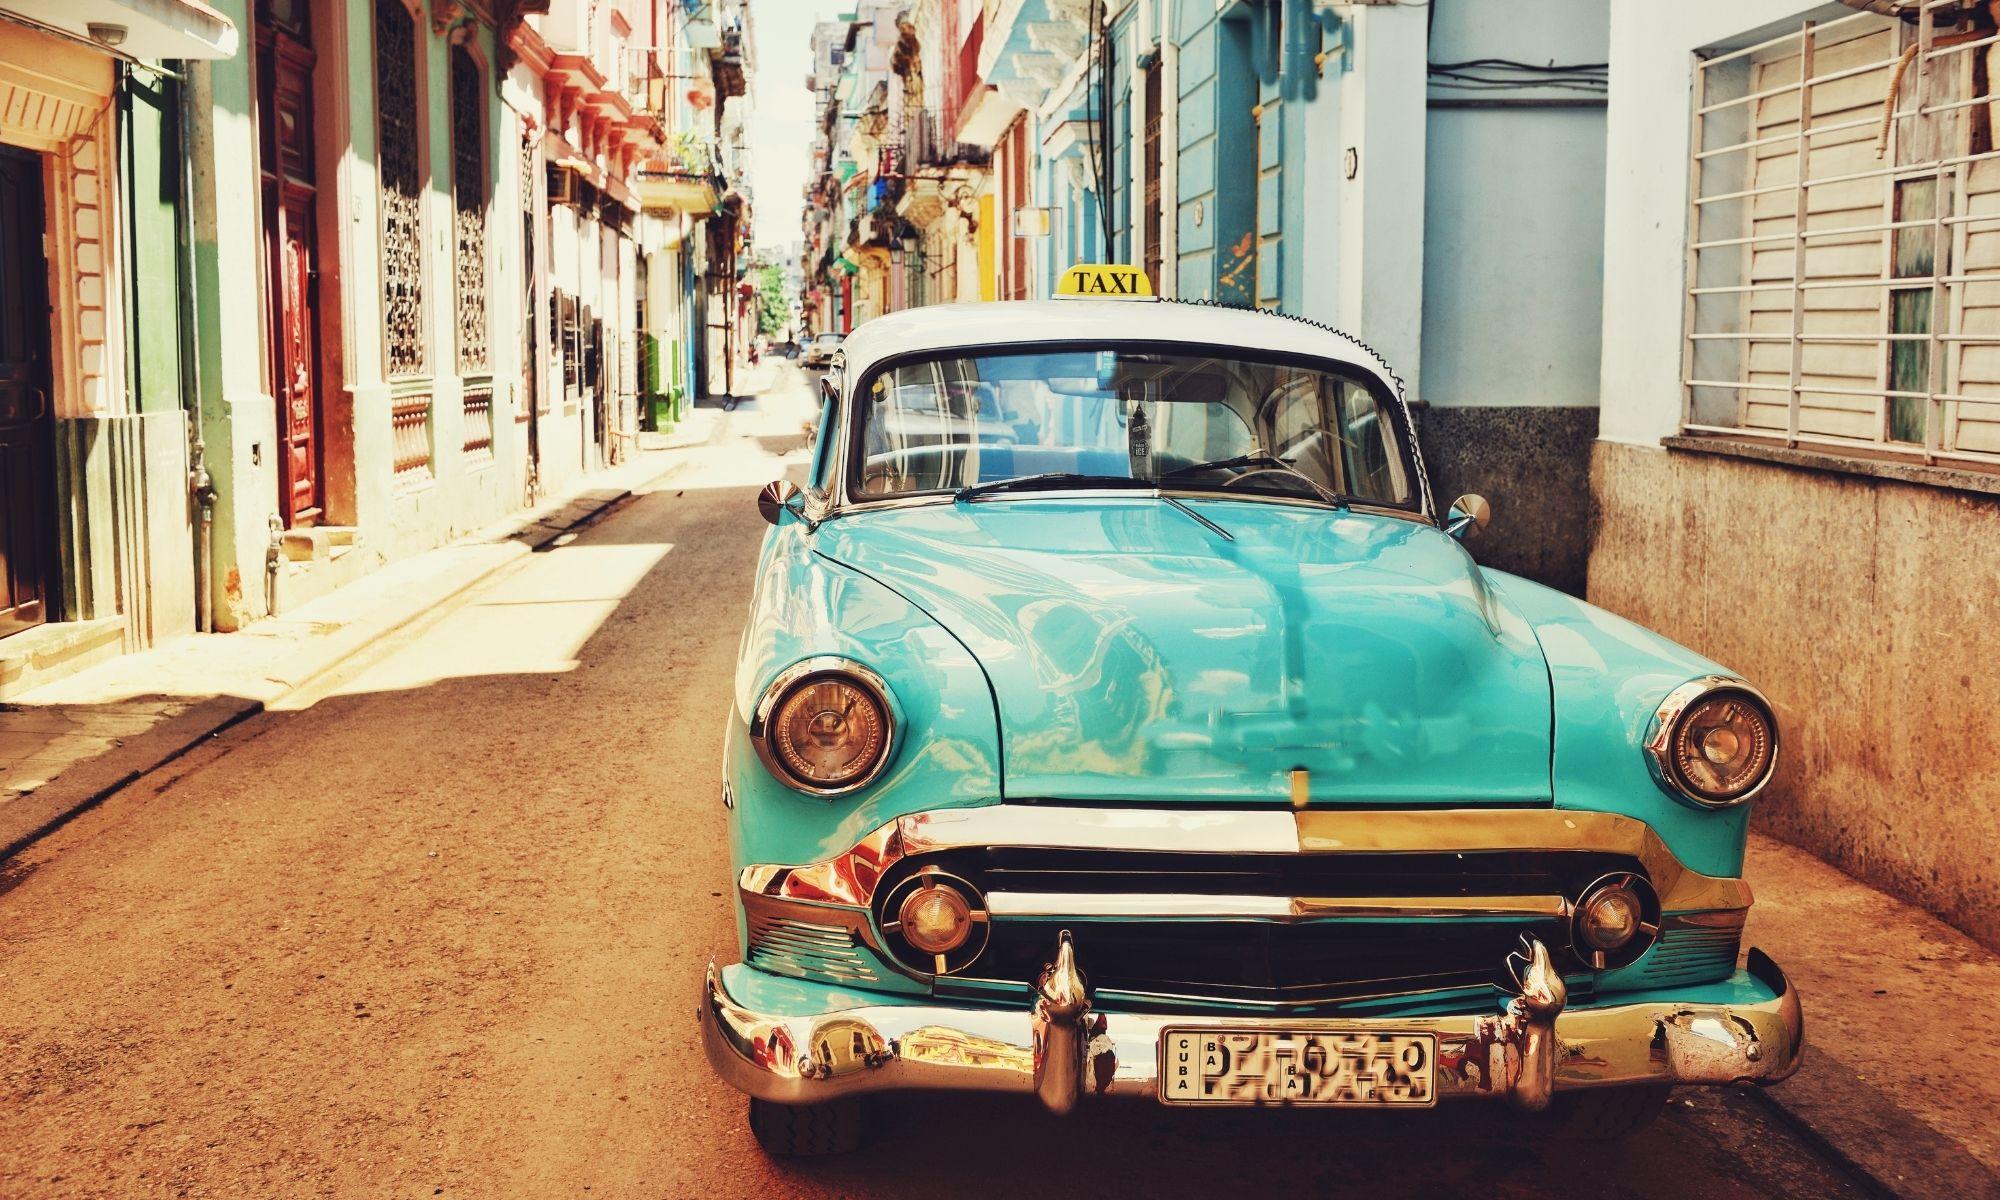 Restaurer une carrosserie de voiture ancienne - 79, 85, 17